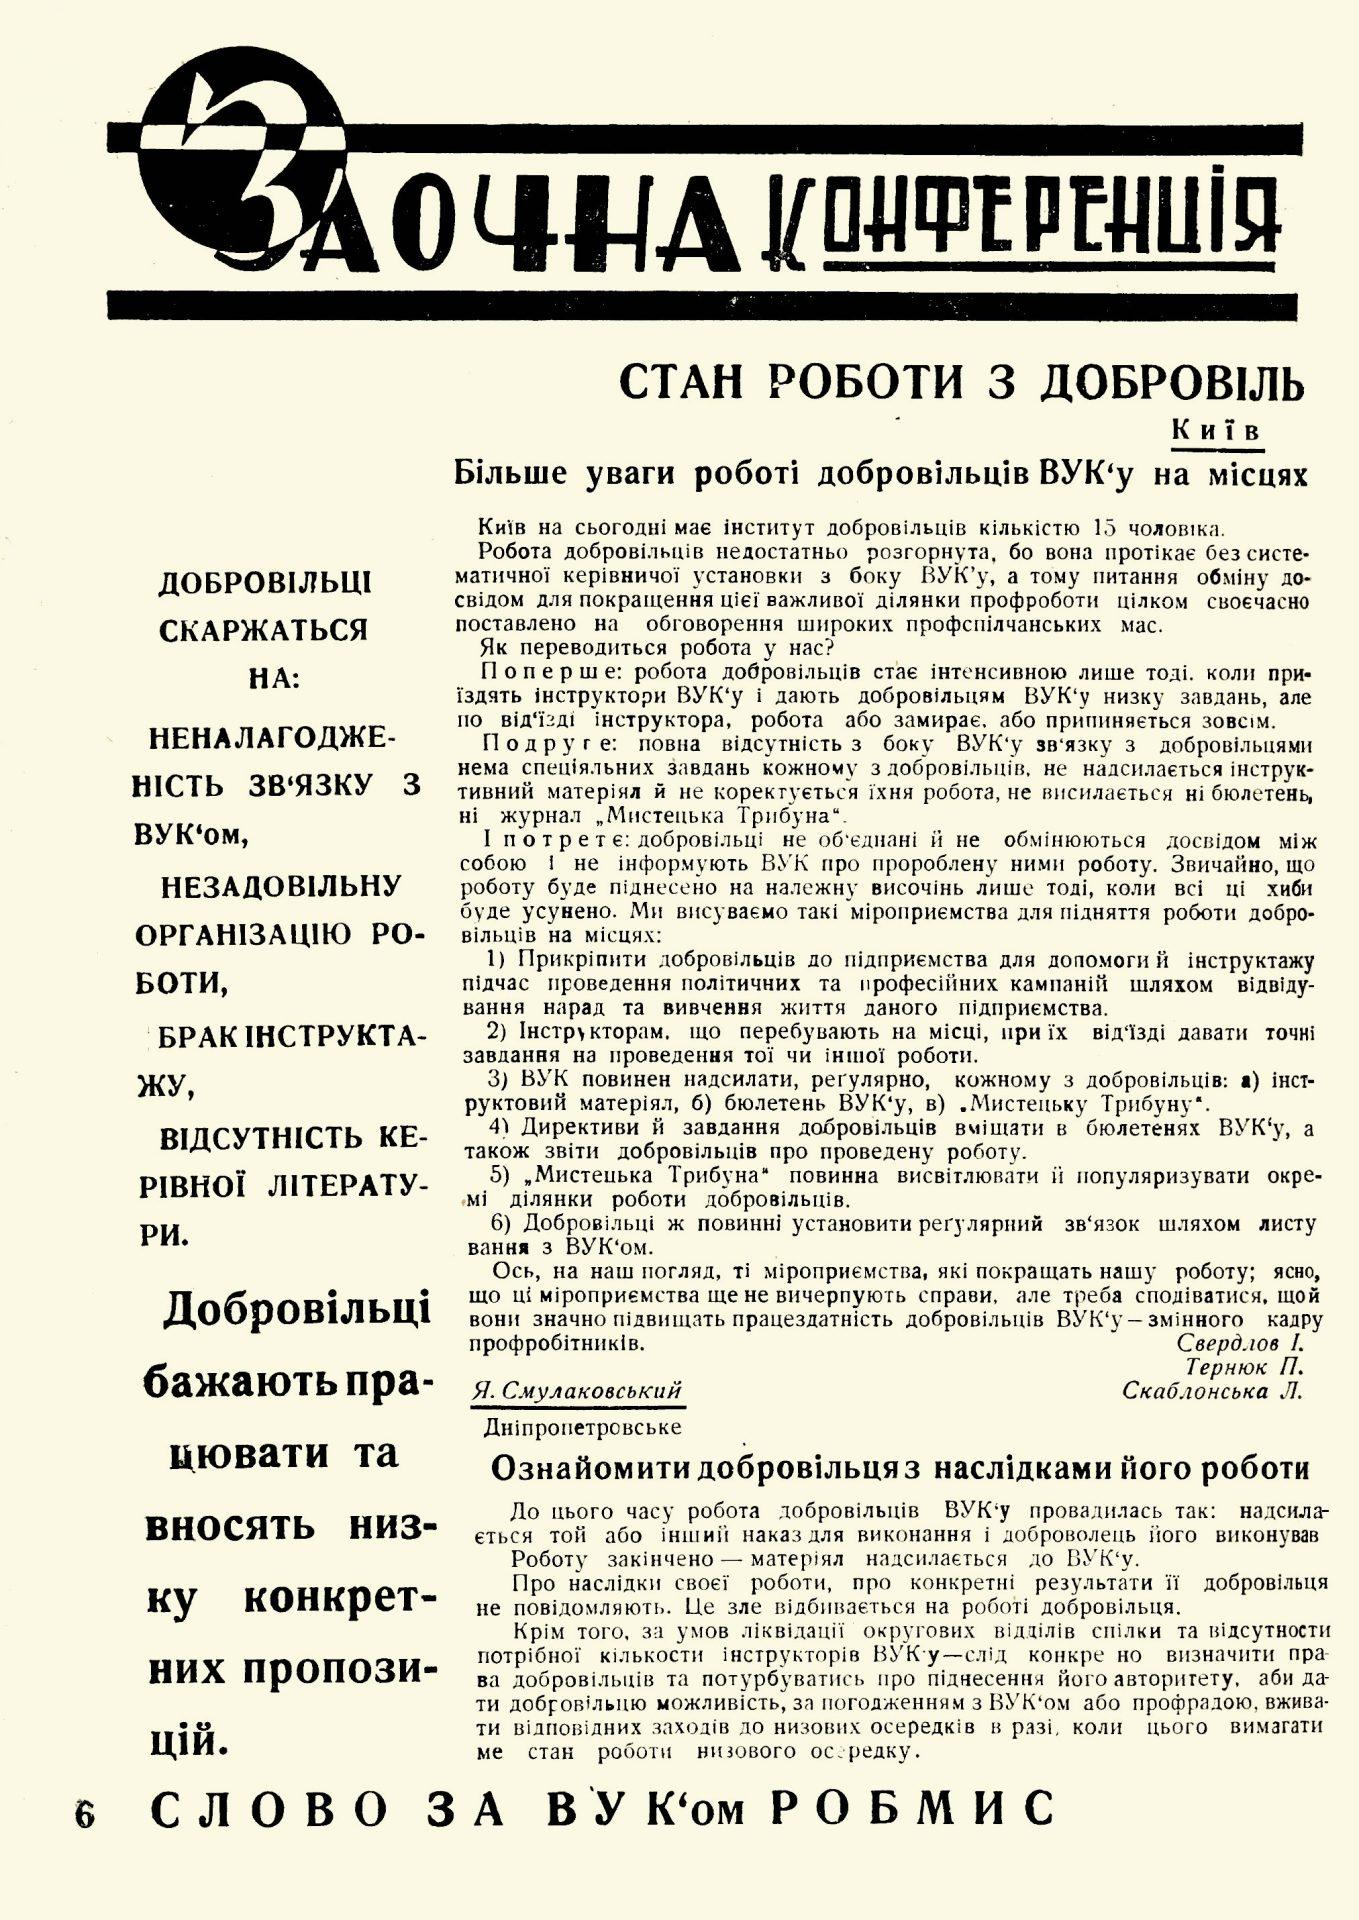 Мистецька трибуна_1931_№ 1